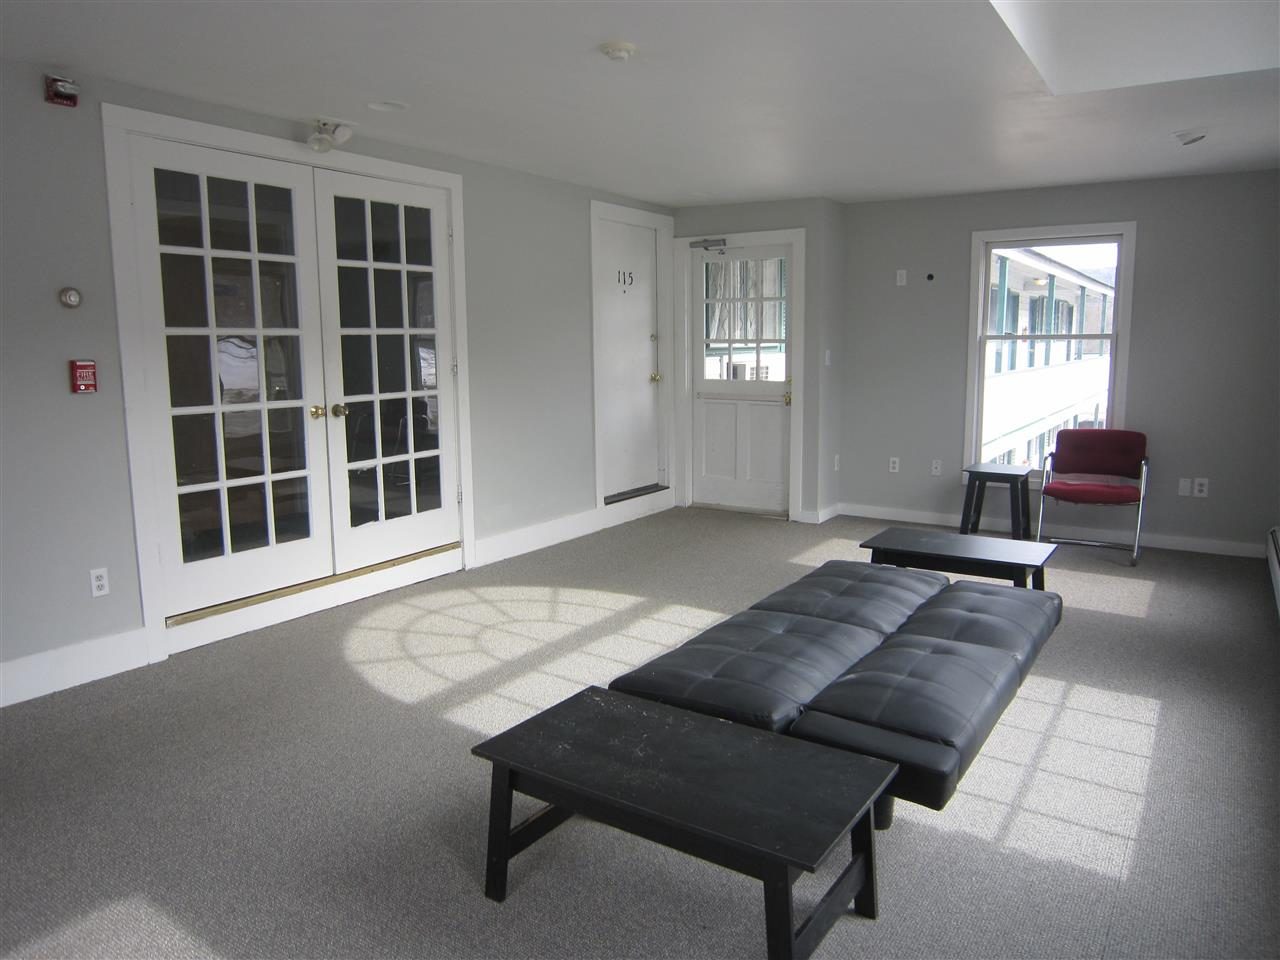 Mount-Snow-Real-Estate-4624810-10